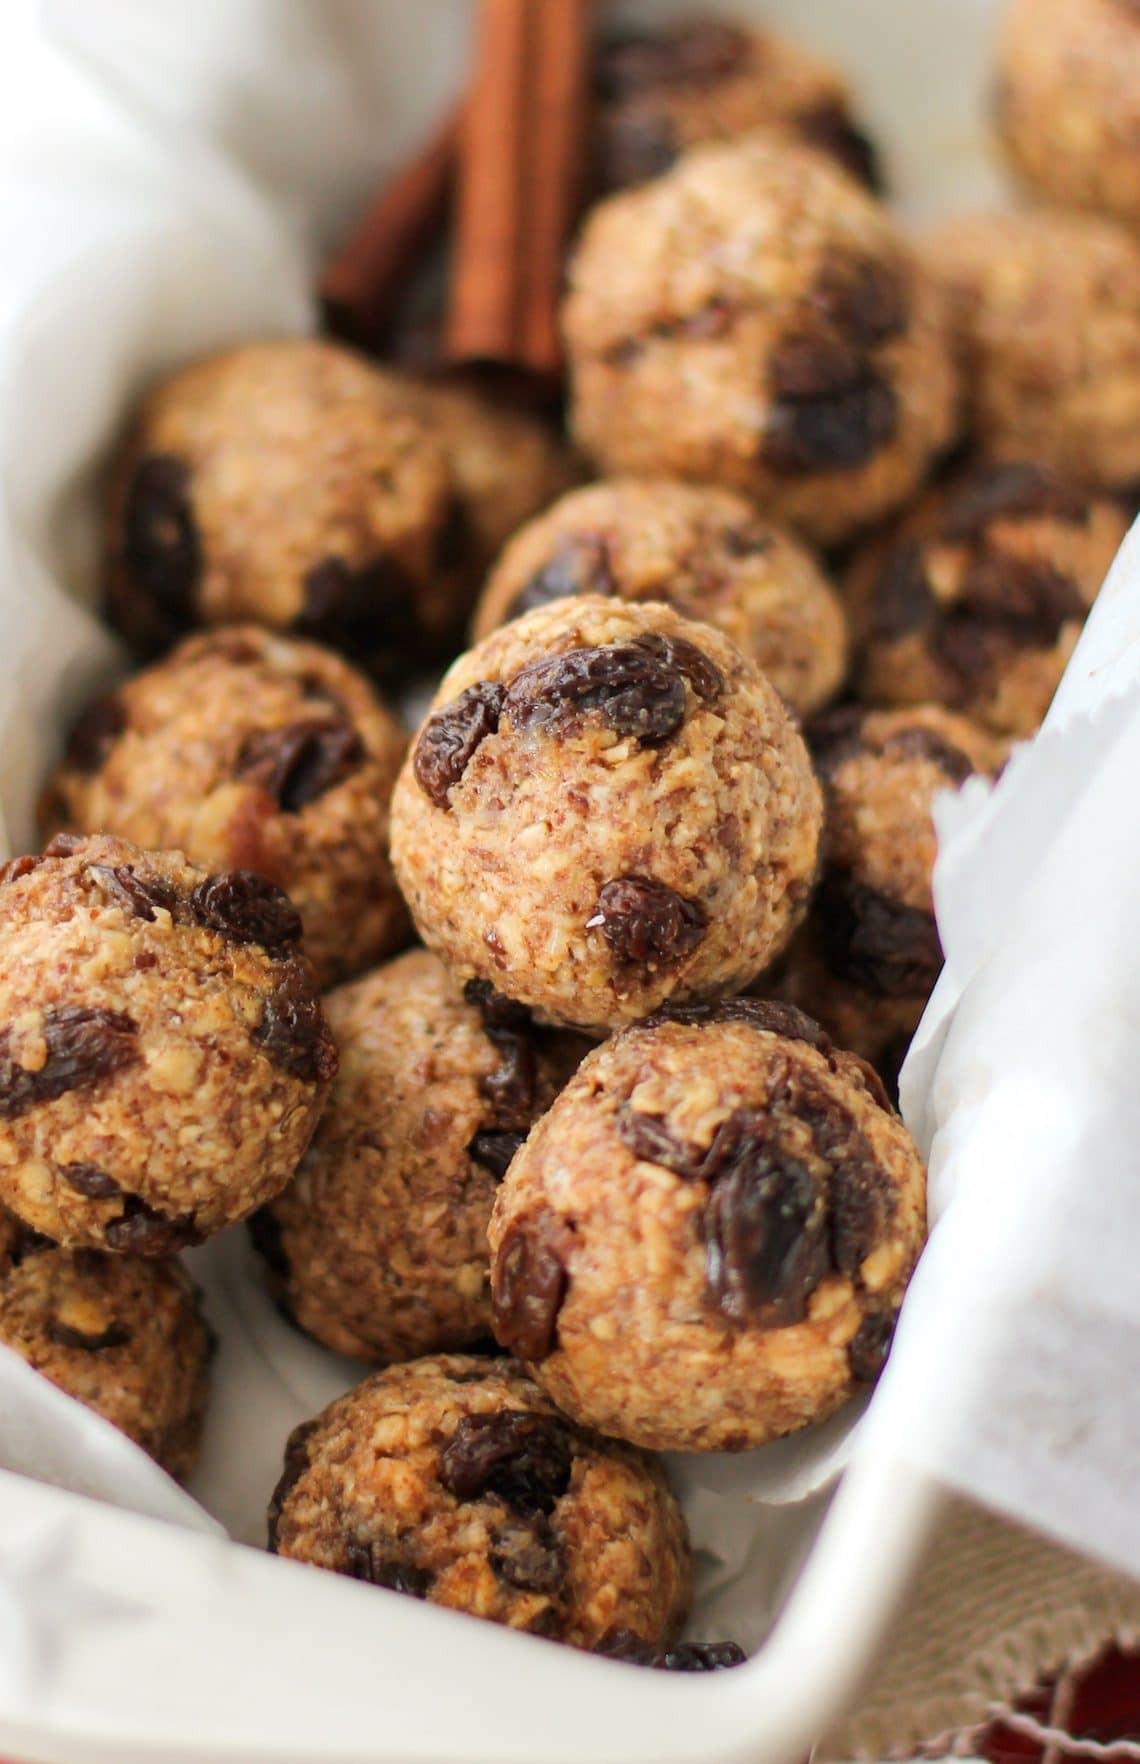 Healthy Vegan Oatmeal Raisin Cookies  Easy No Bake Oatmeal Raisin Cookie Energy Bites gluten